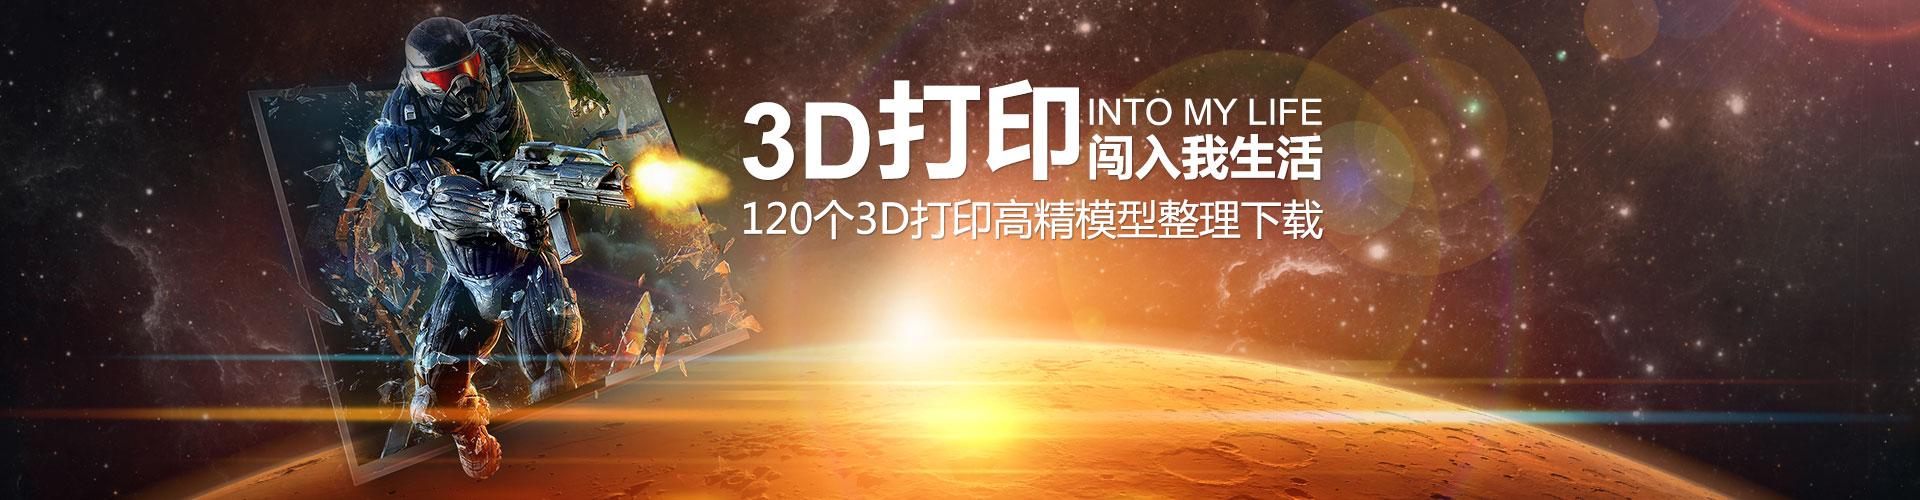 3D打印模型专题